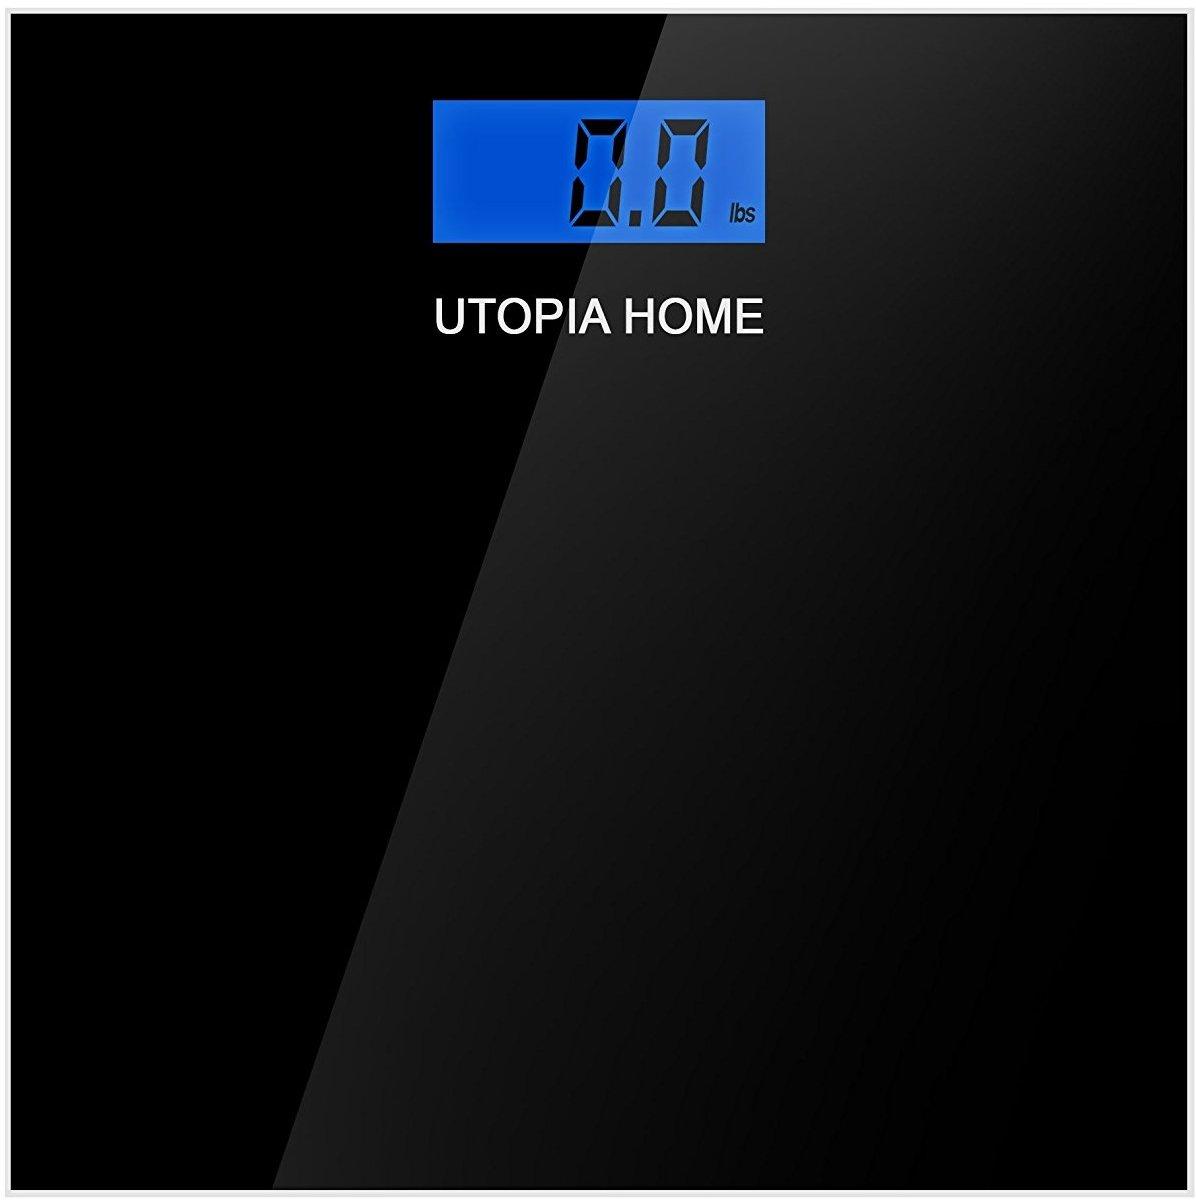 Utopia Home Digital Glass Bath...